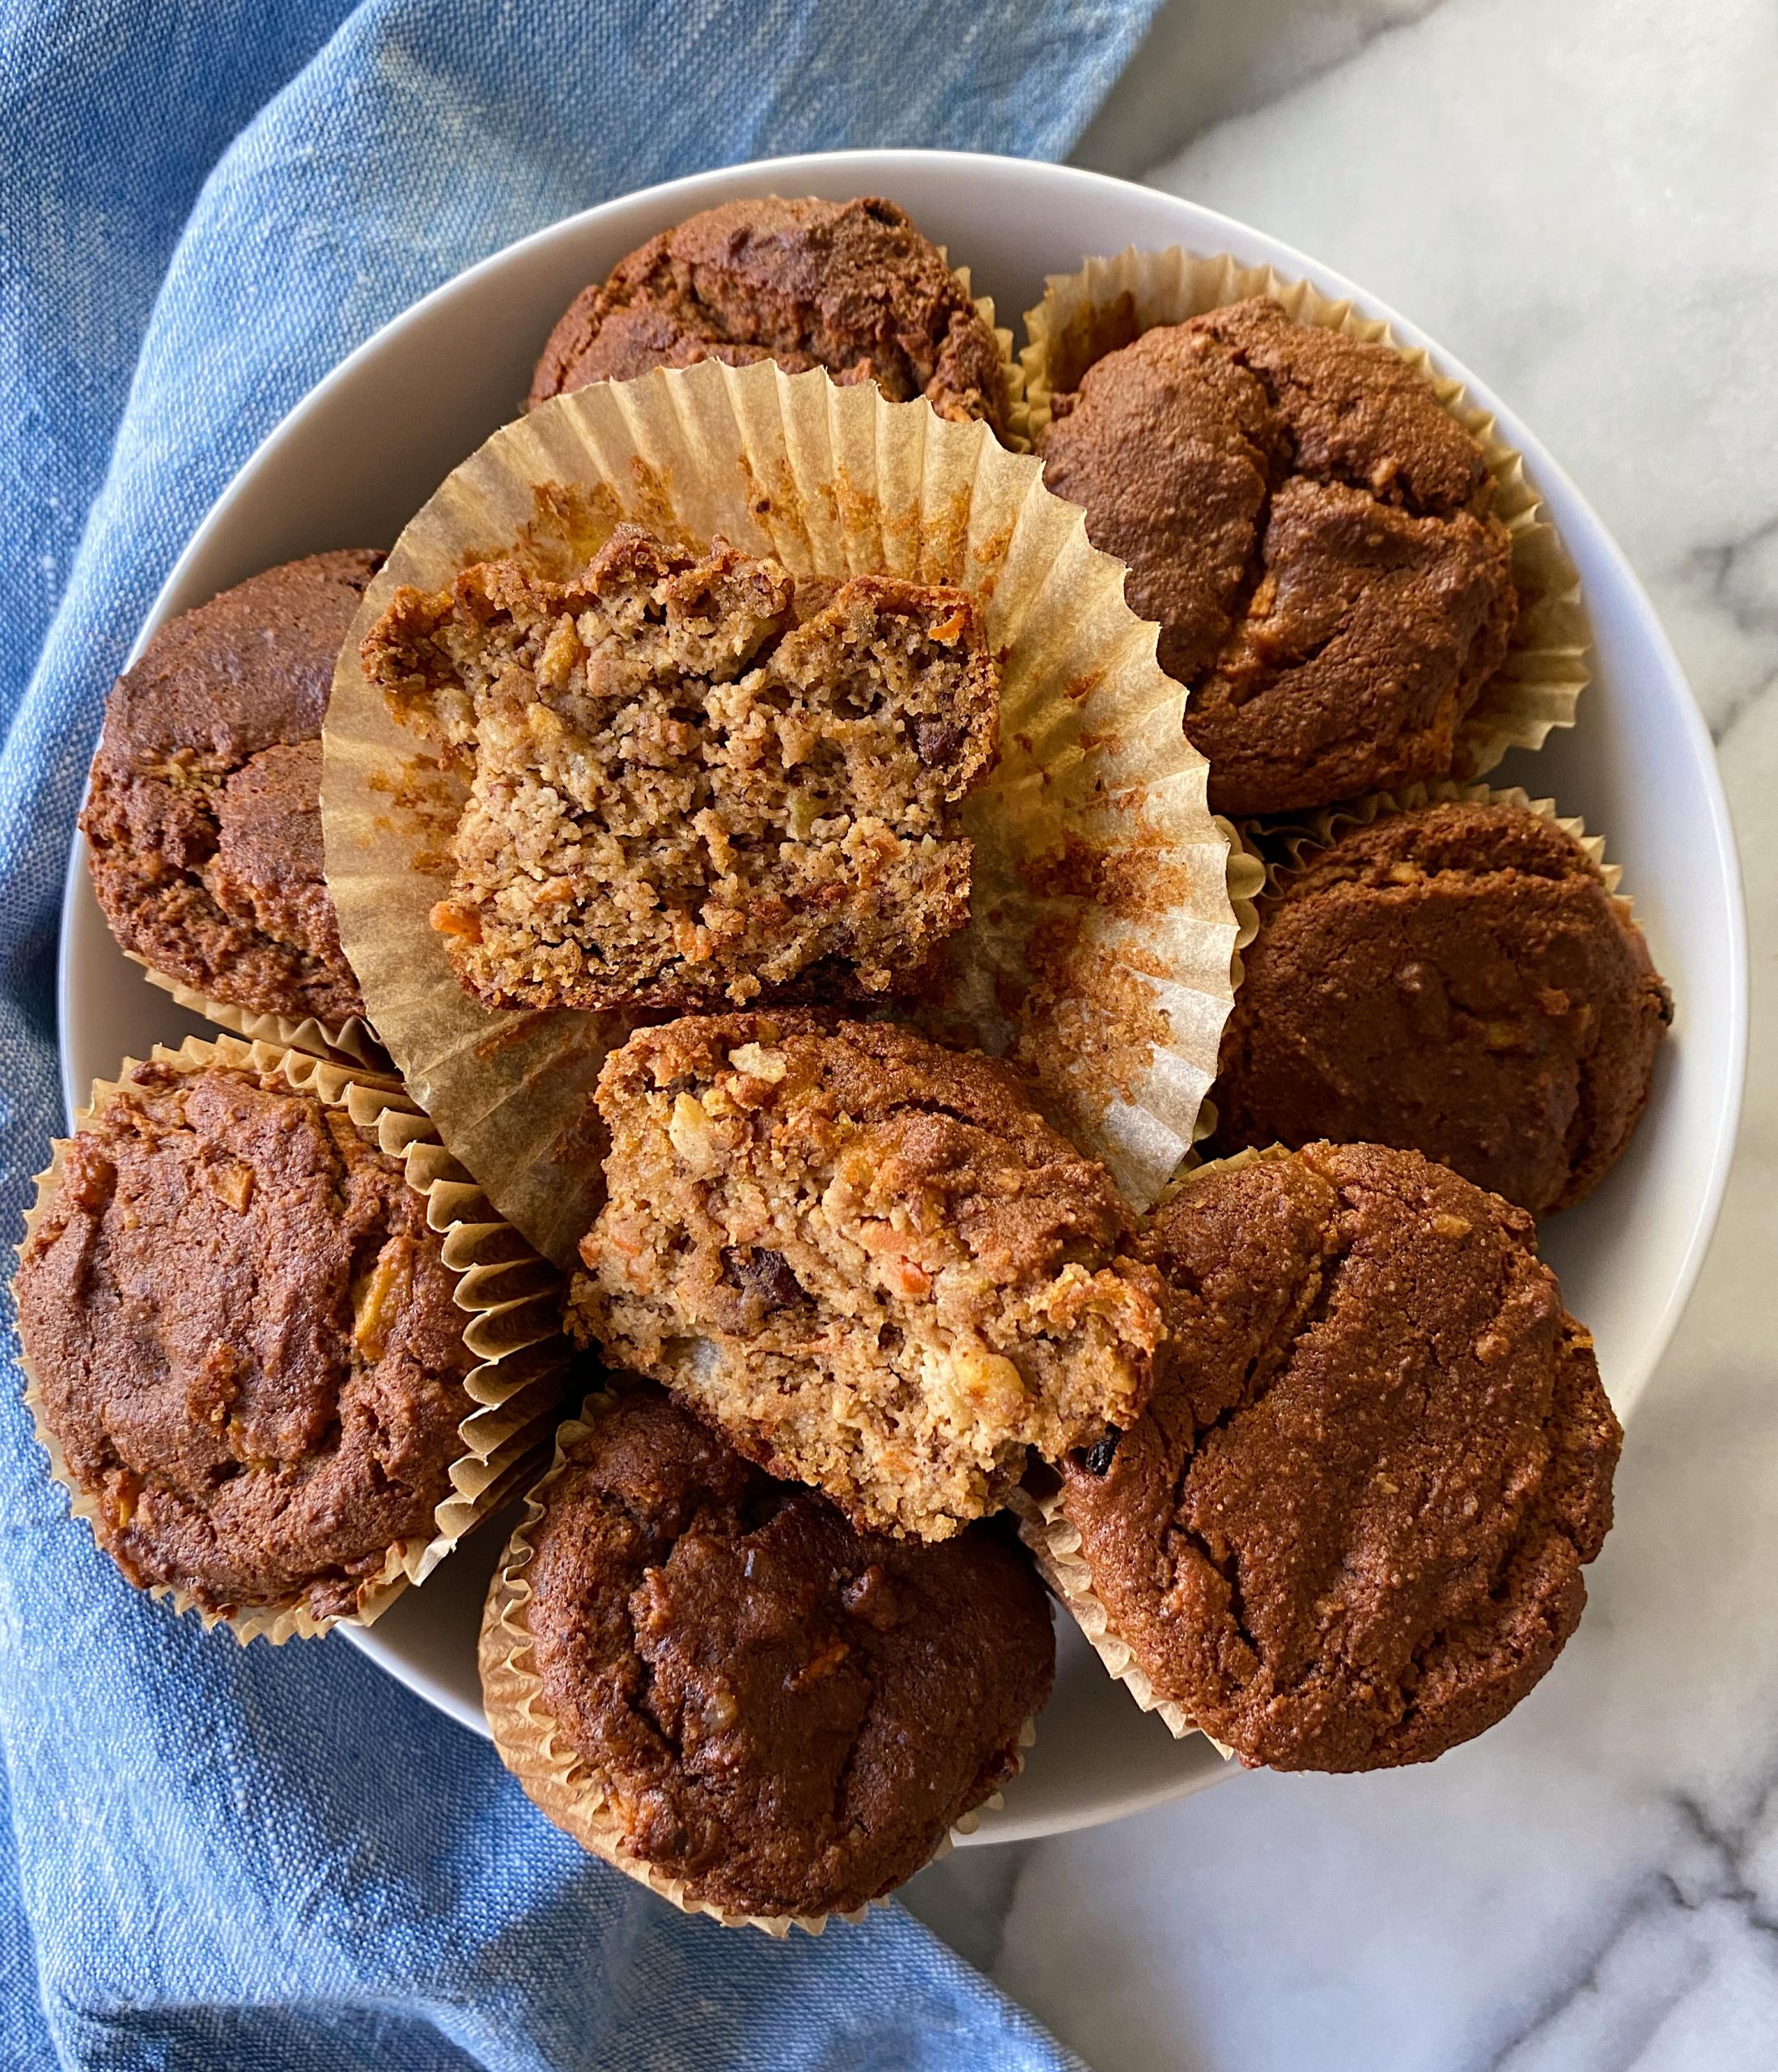 almond flour morning glory muffins easy recipe gluten free www.healthygffamily.com